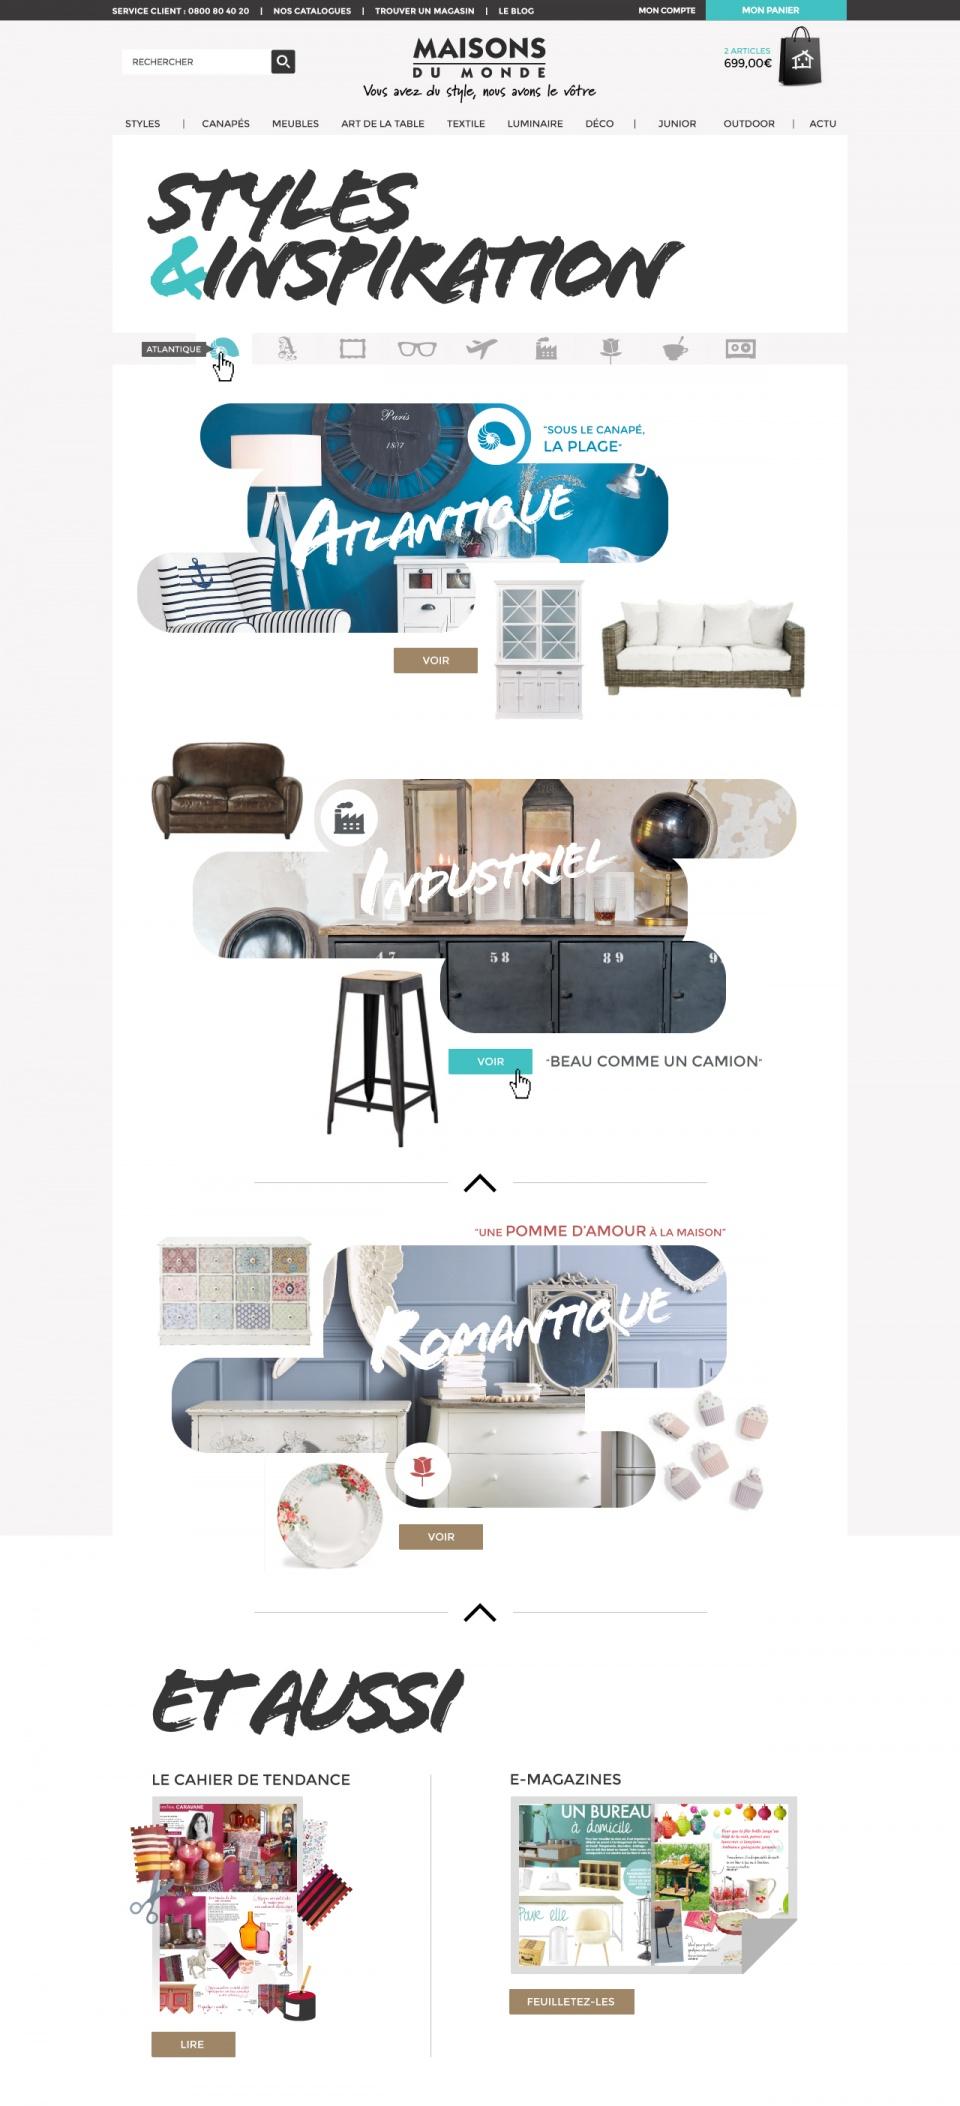 Style et inspiration app design